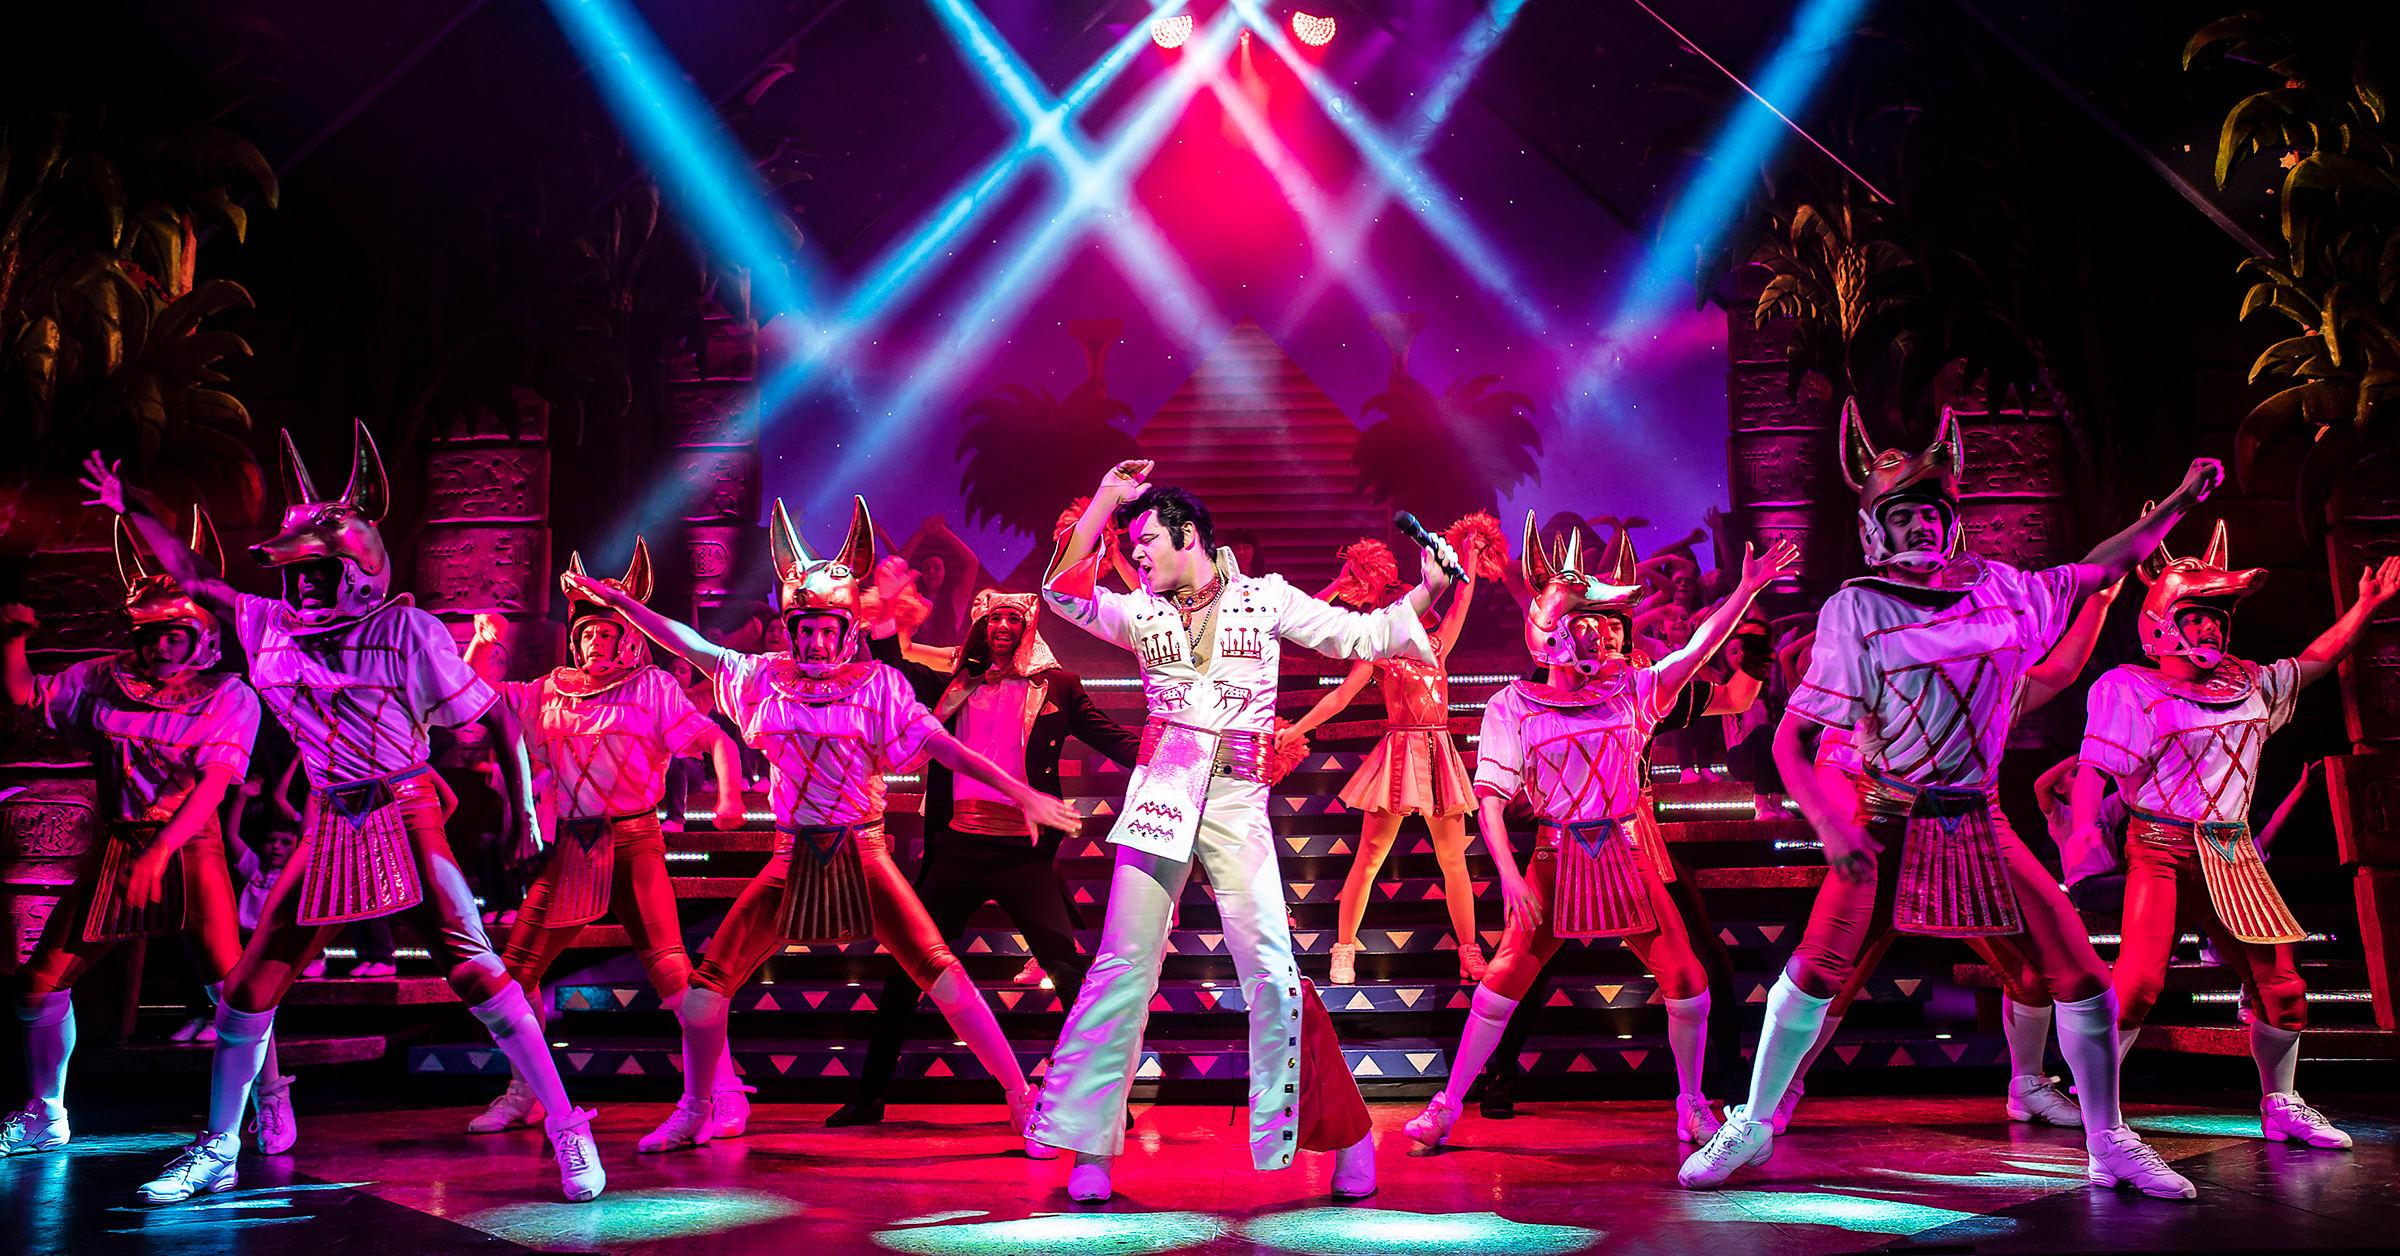 Joseph and the Amazing Technicolor Dreamcoat at New Wimbledon Theatre